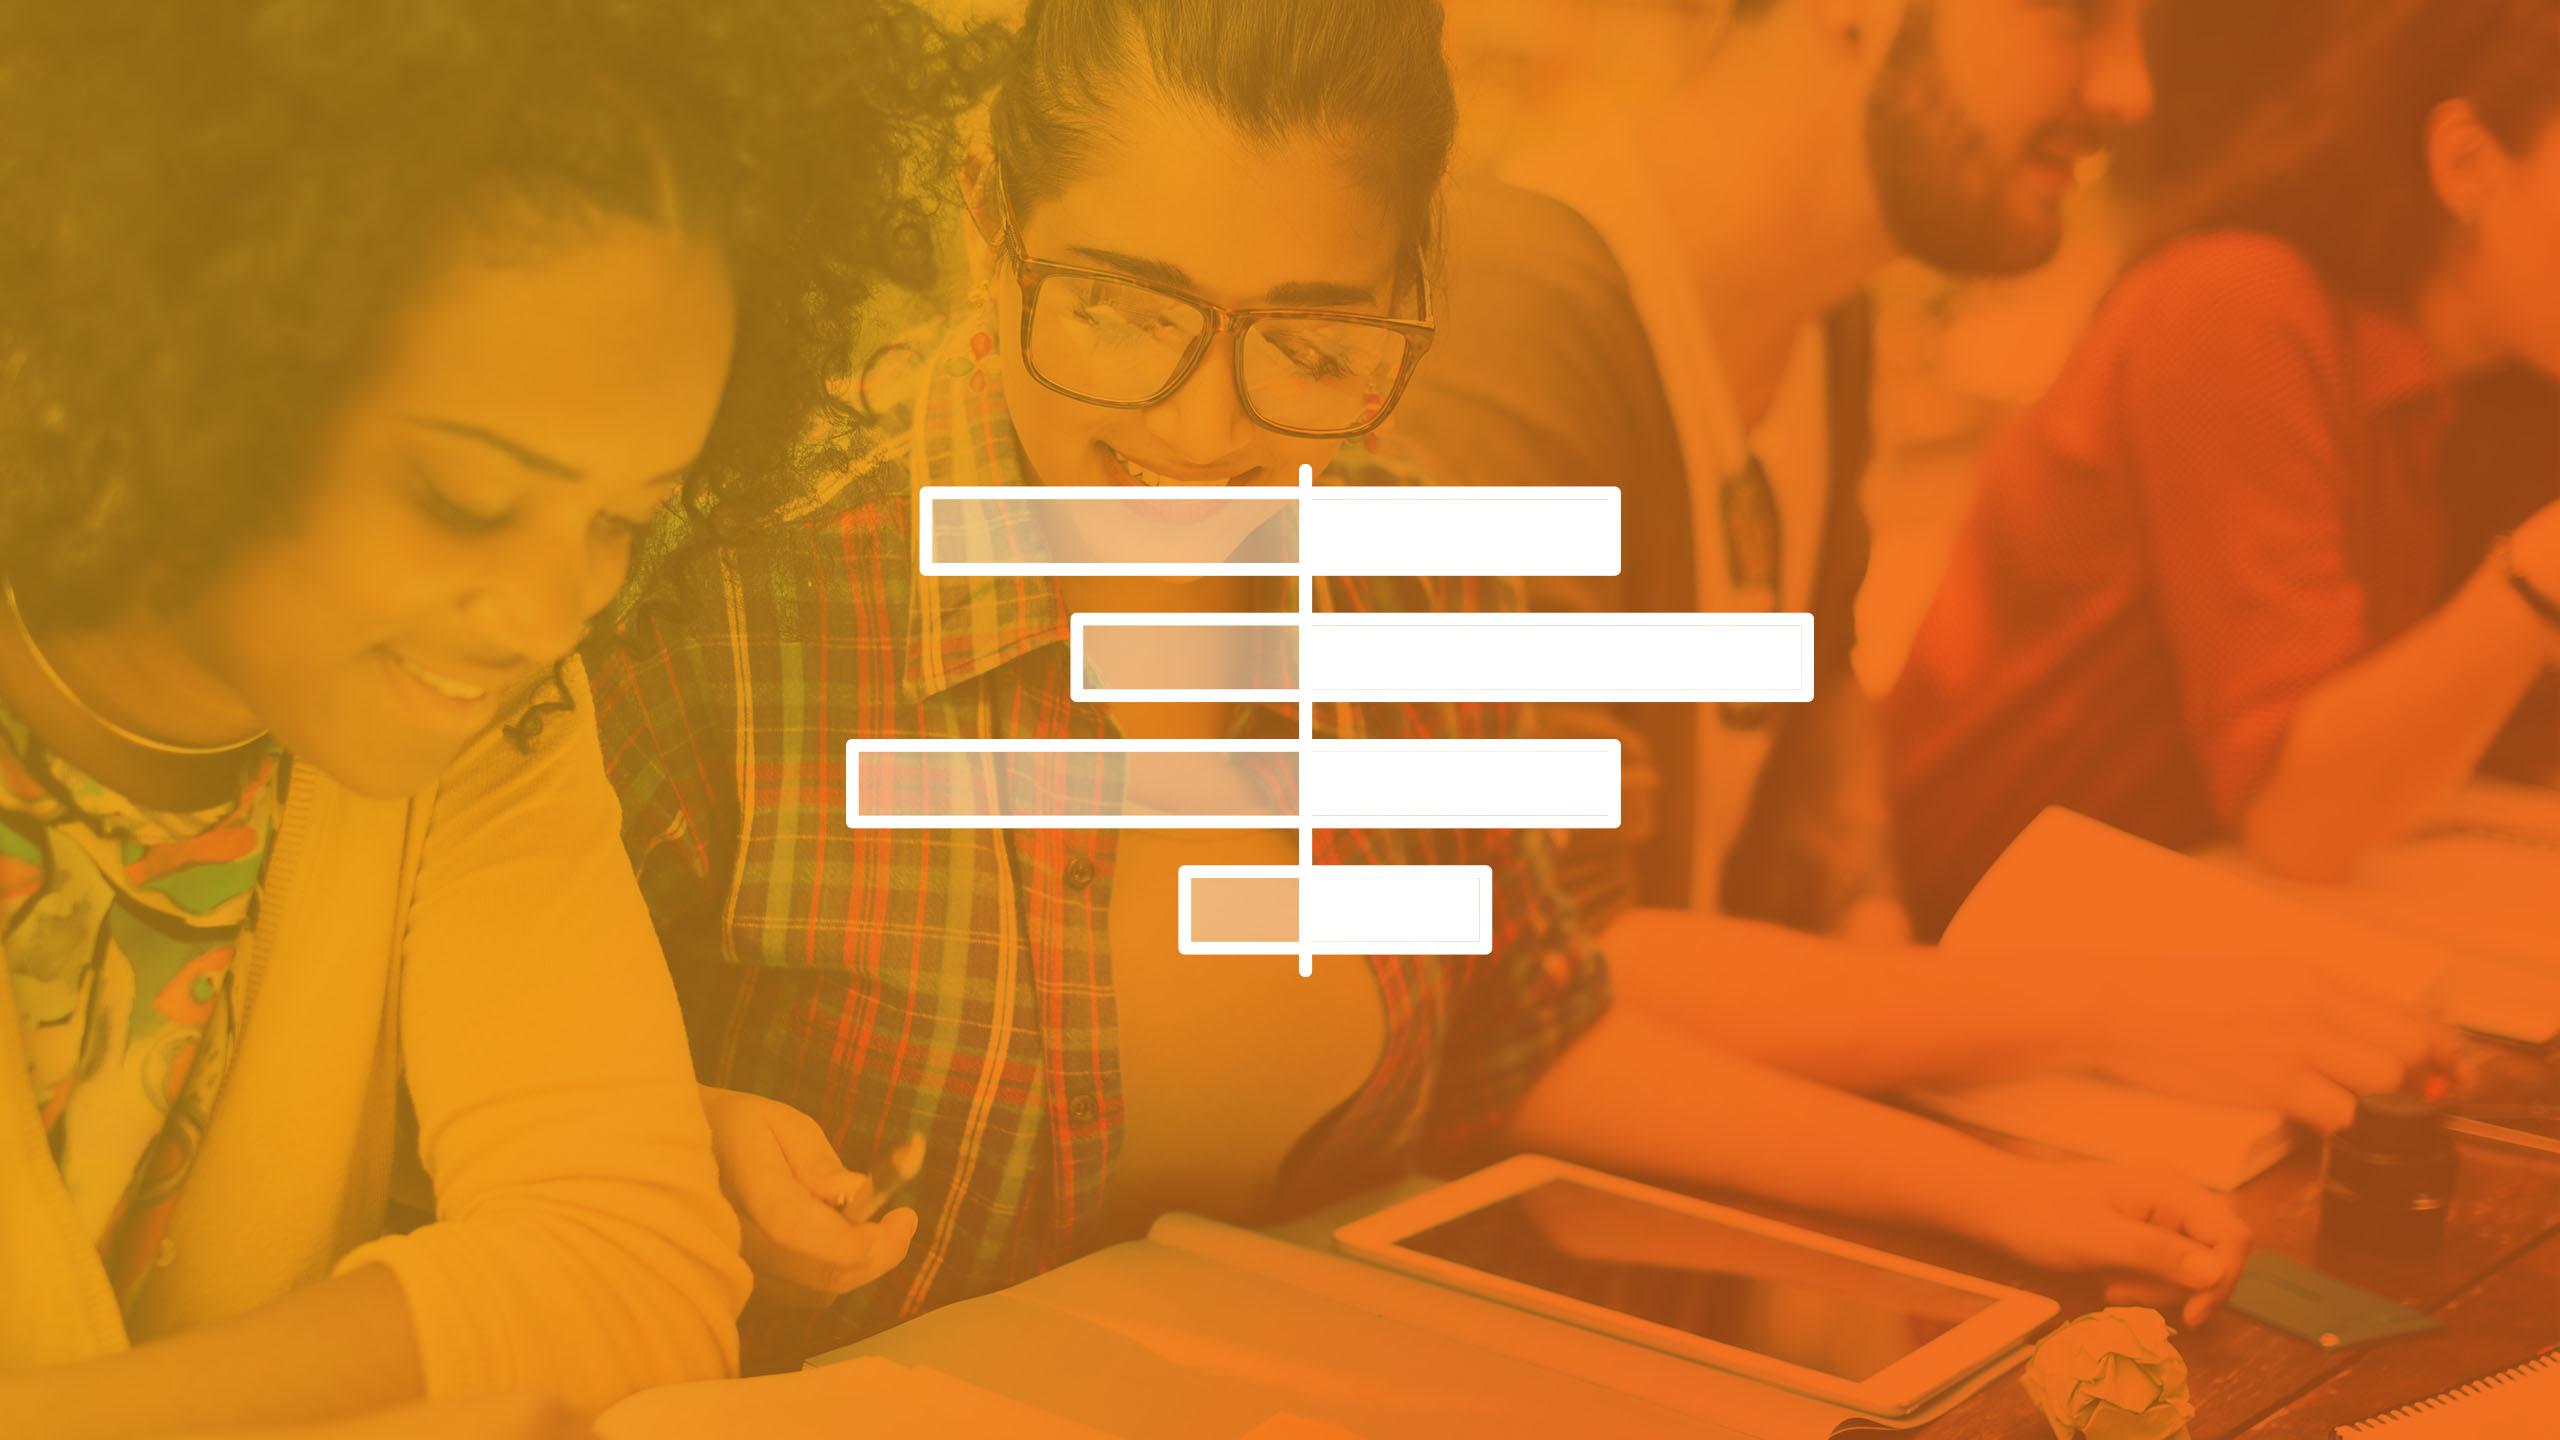 Equity-Centered Assessment